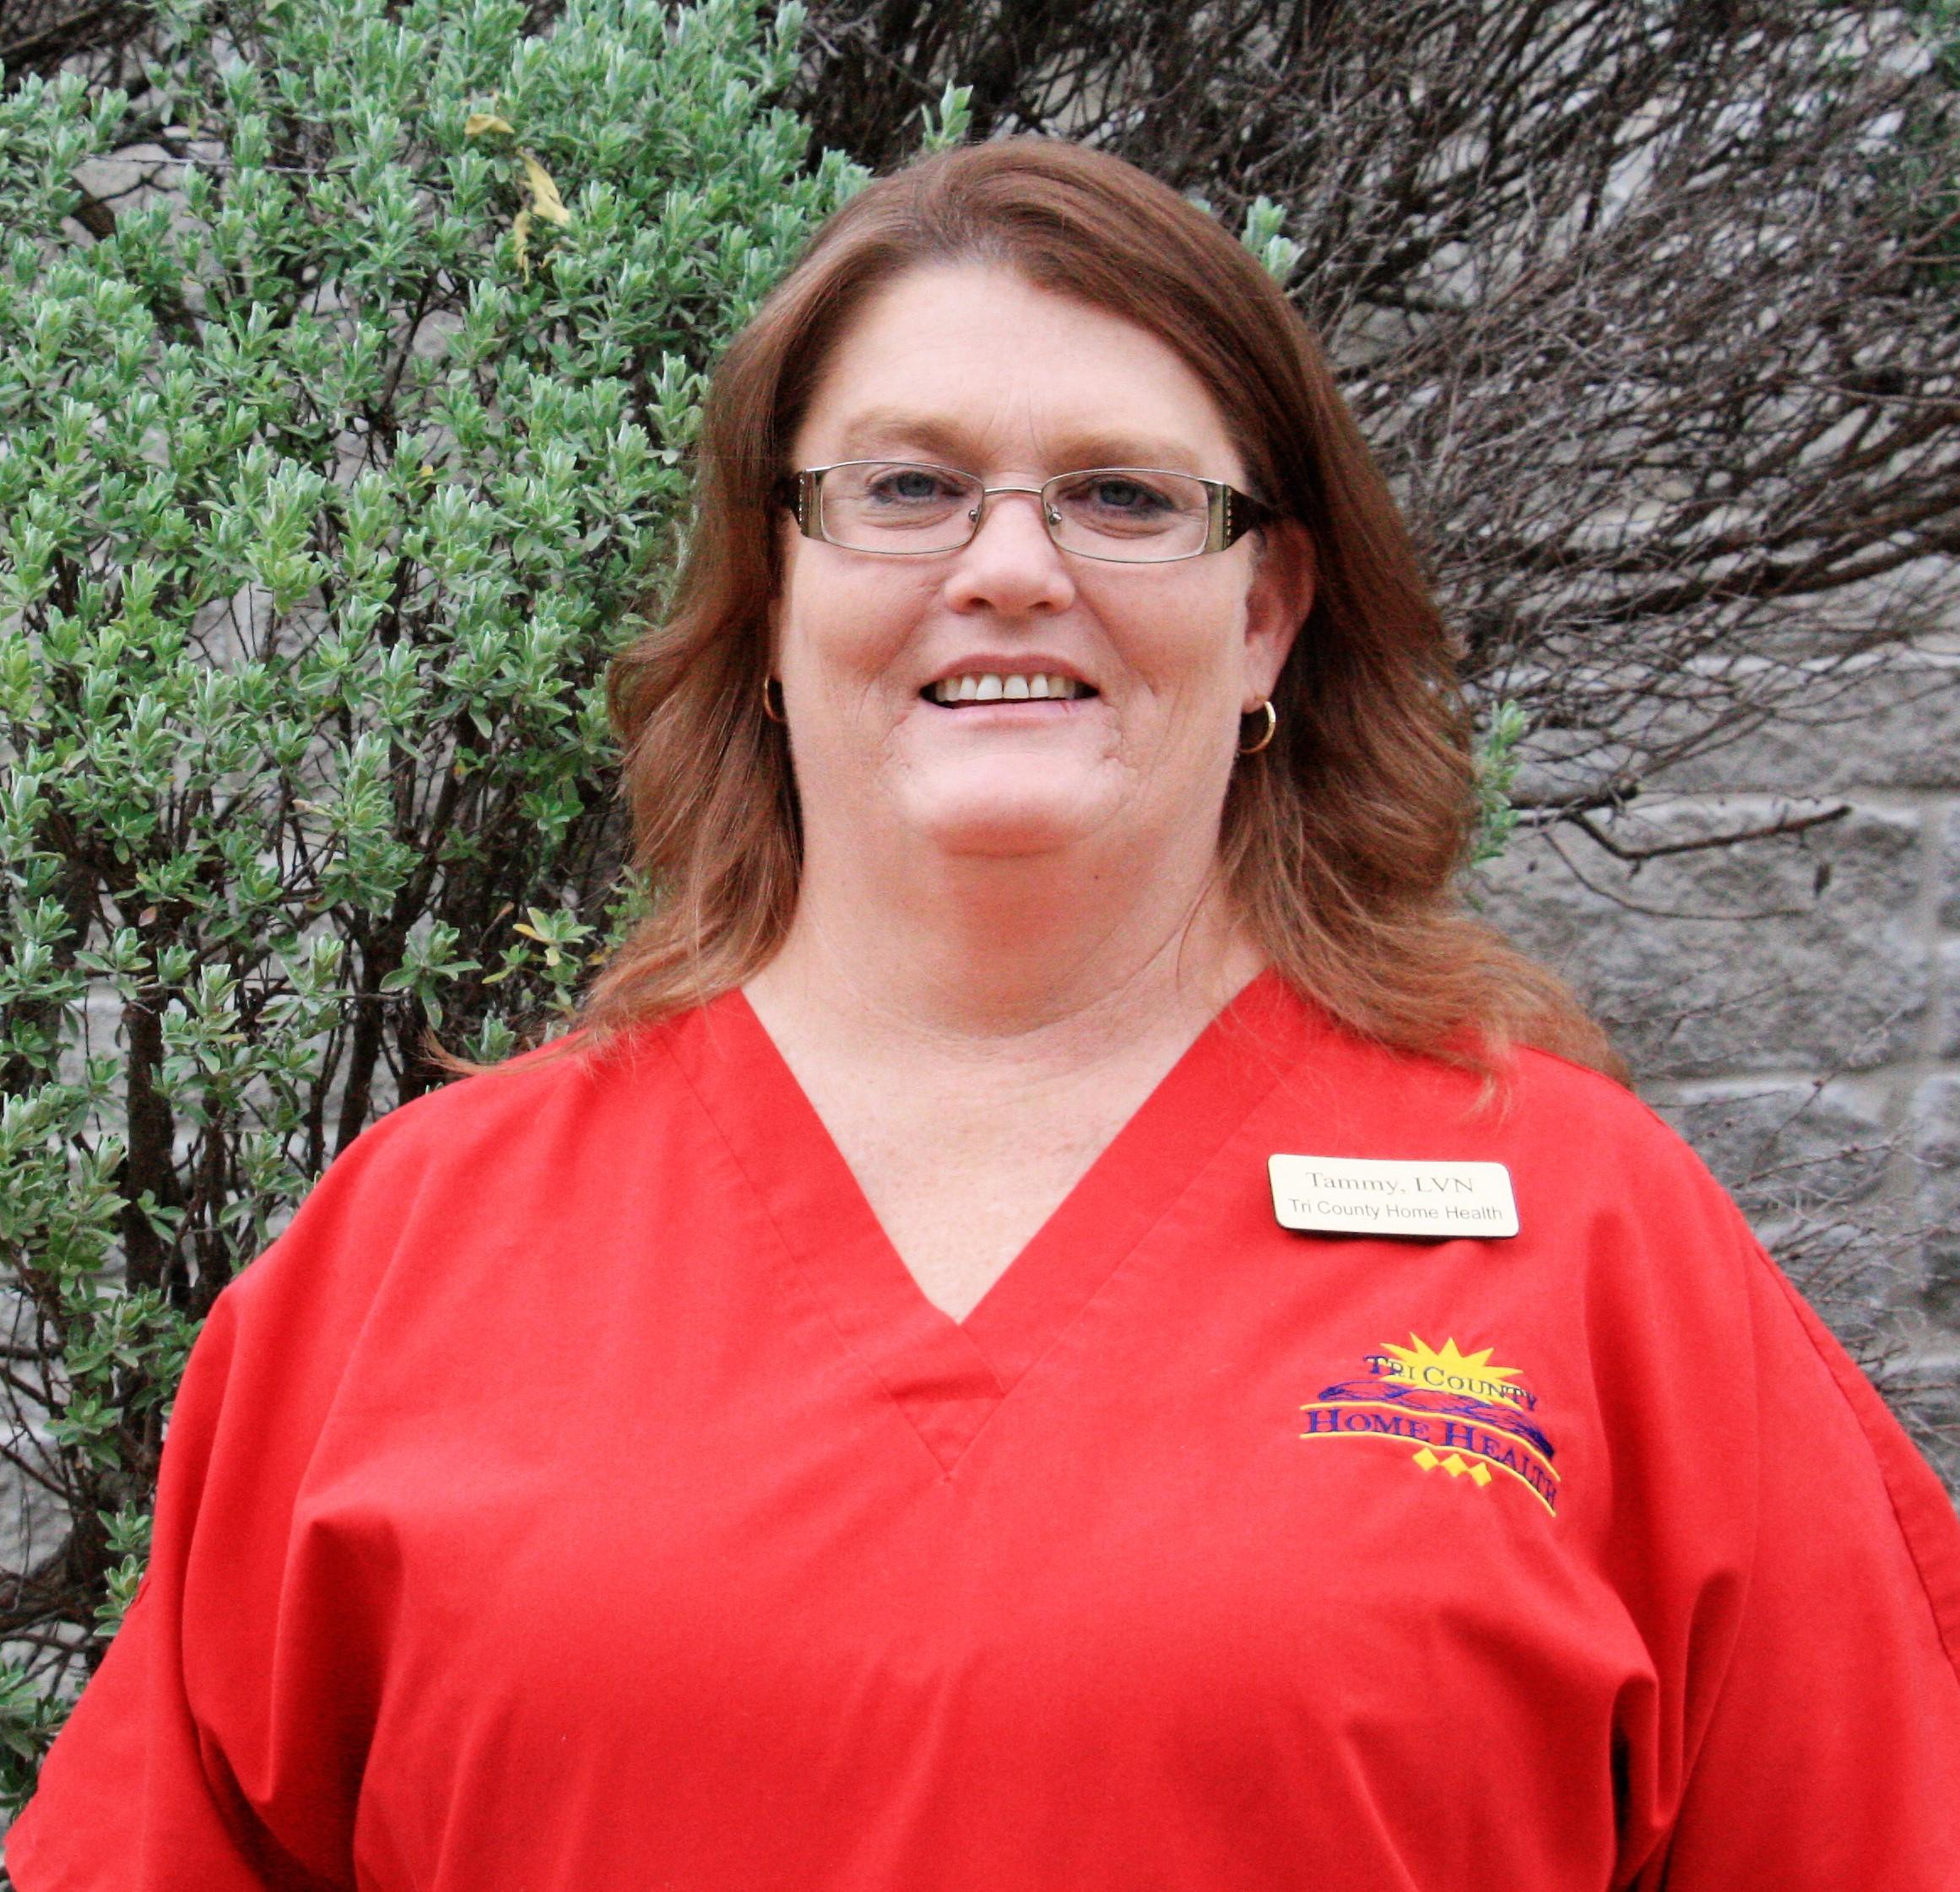 Tammy Mains, LVN<br> Field Nurse